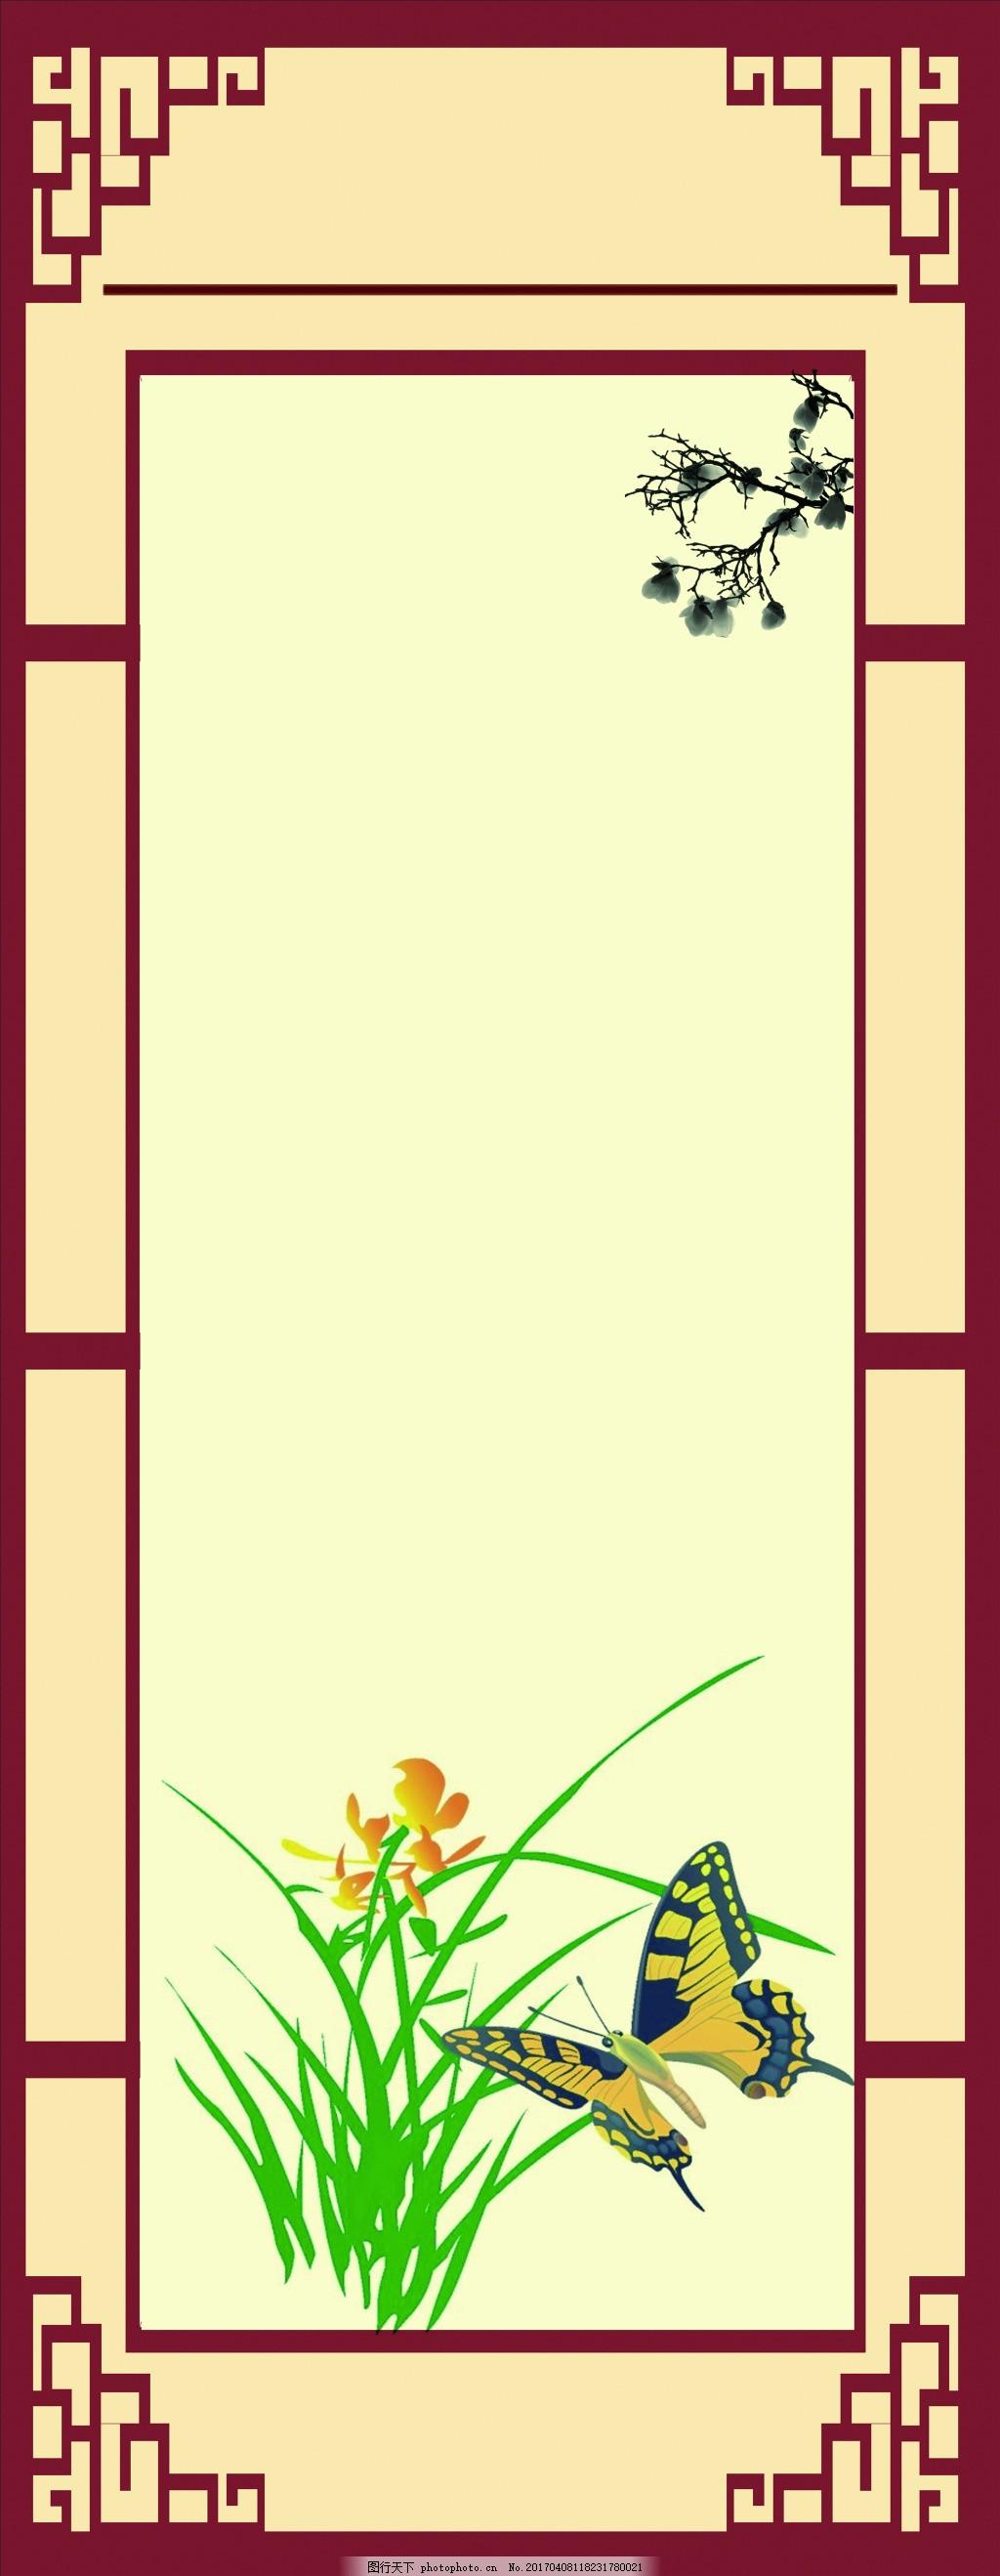 ppt 背景 背景图片 边框 模板 设计 相框 1024_2637 竖版 竖屏